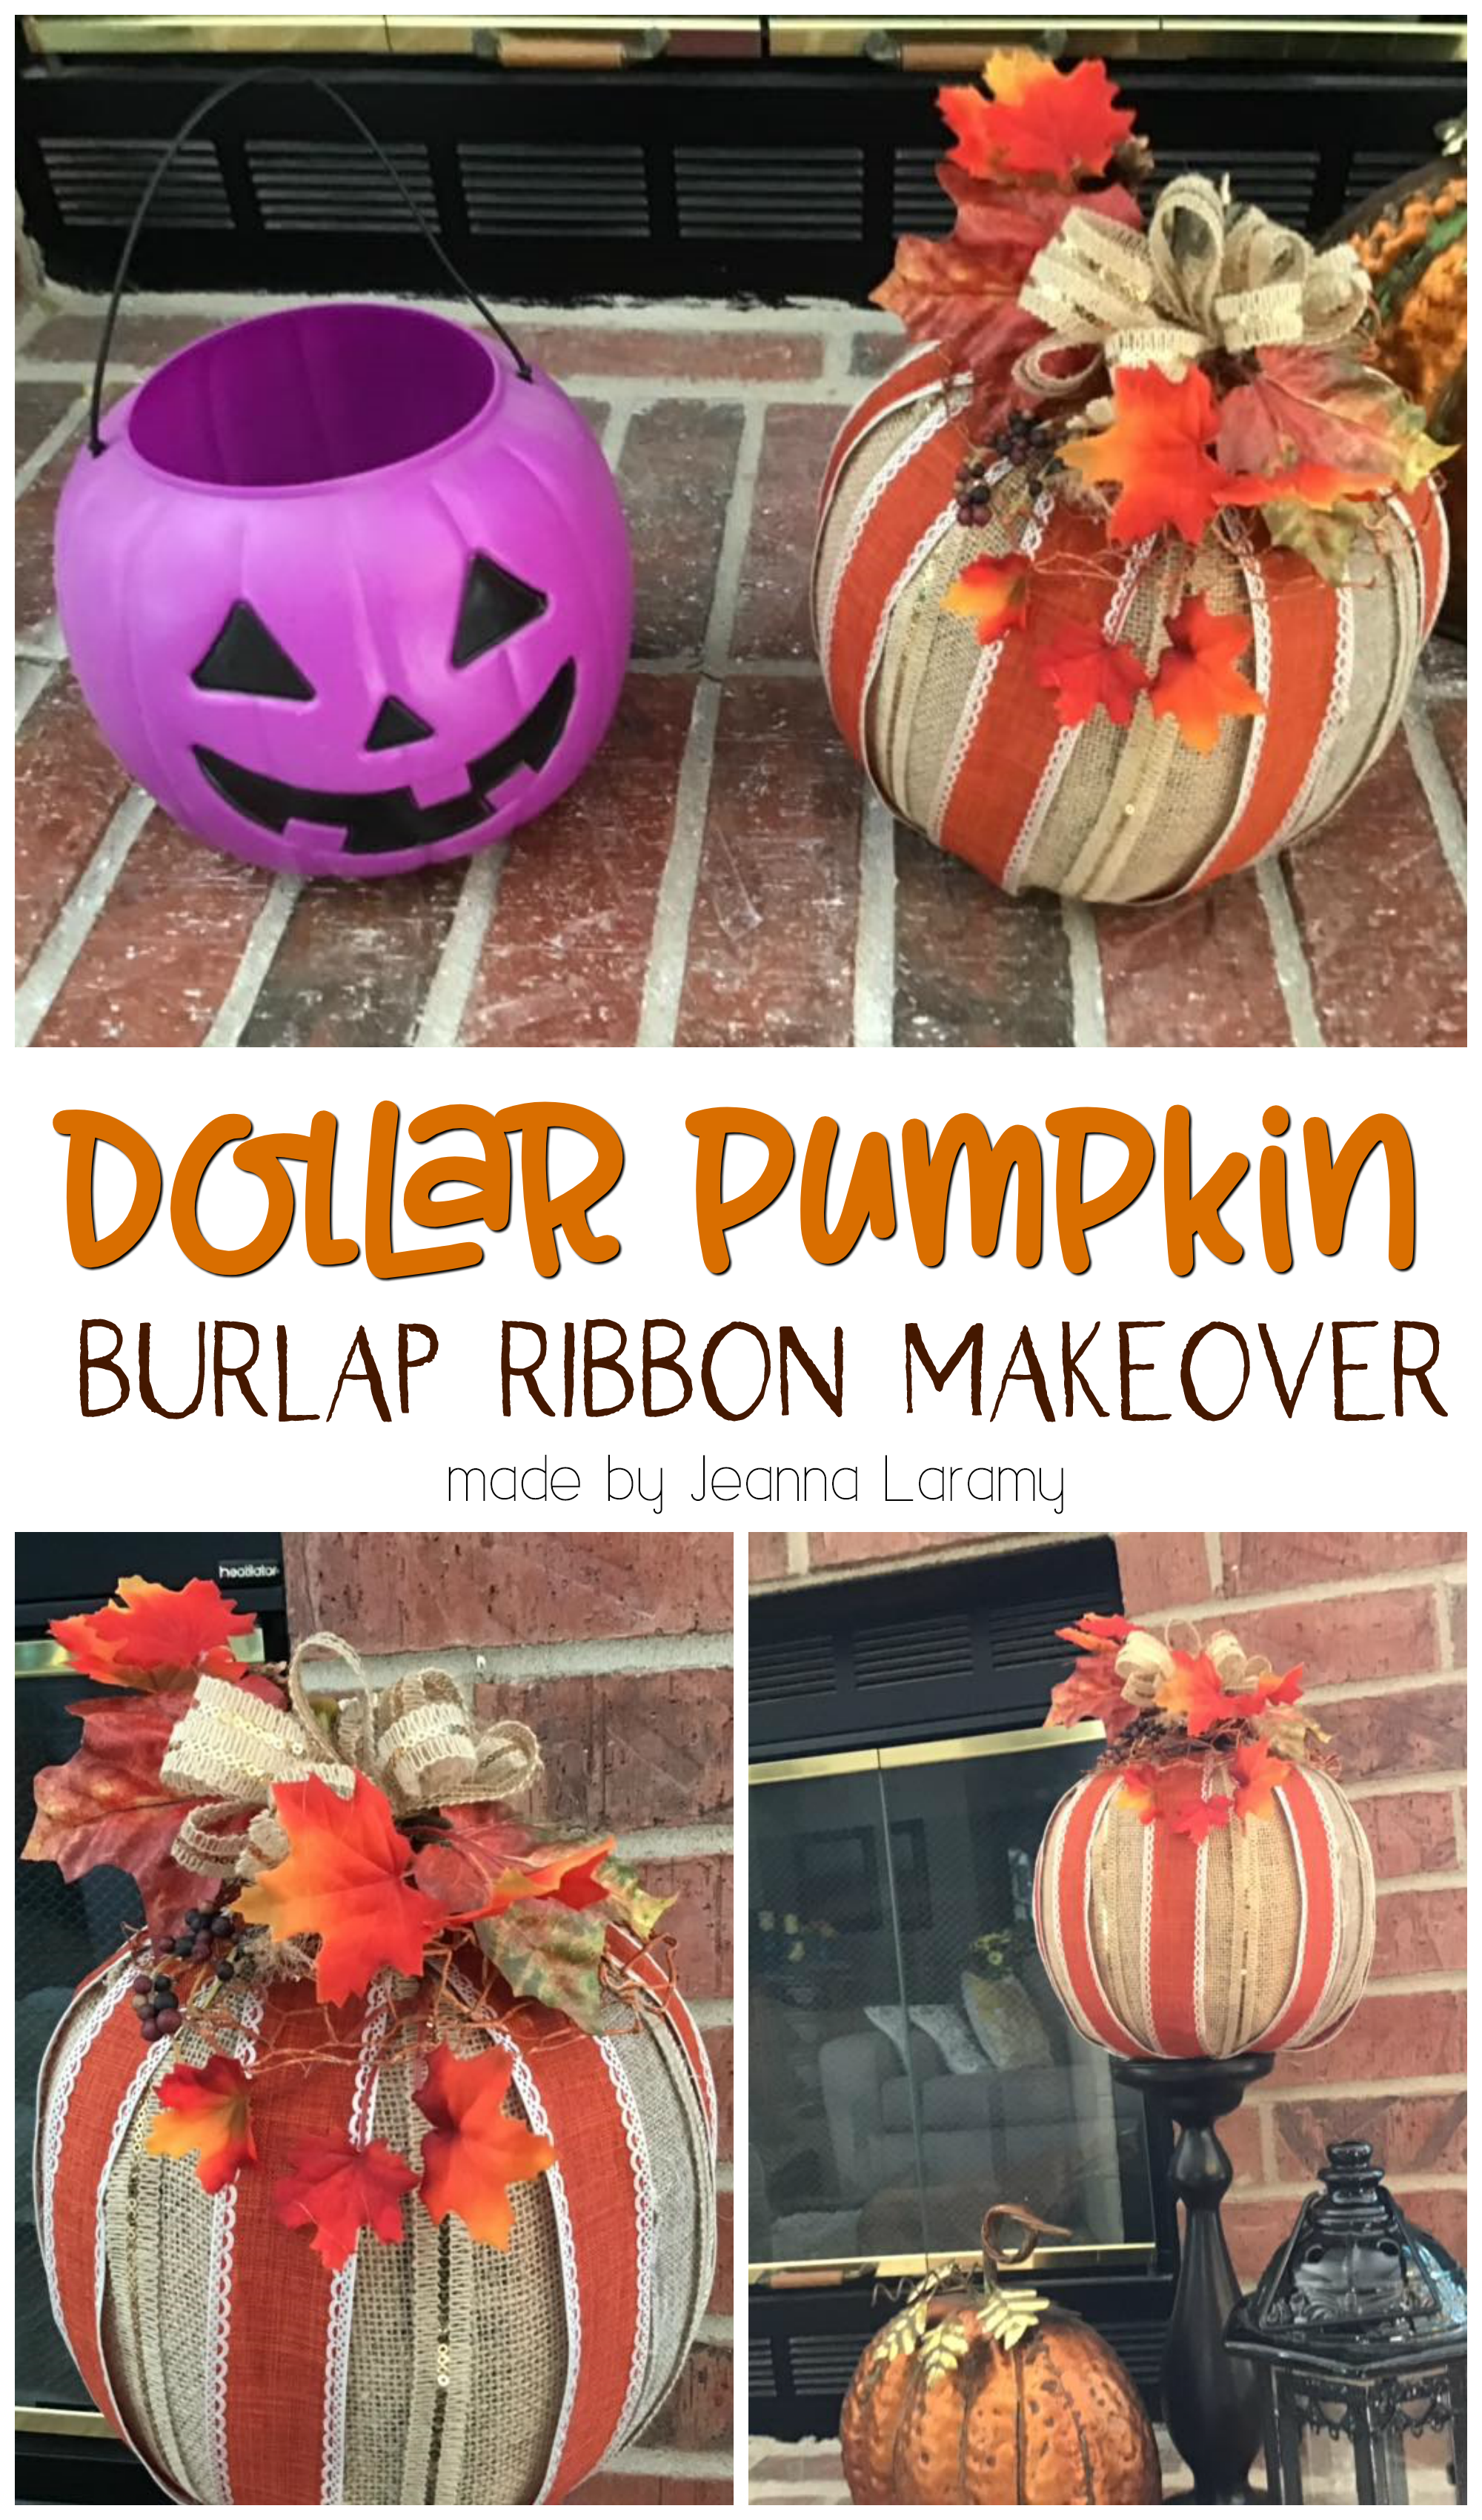 - Fast Shipping 1 Foam Carvable Pumpkin Decoration Halloween // Thanksgiving